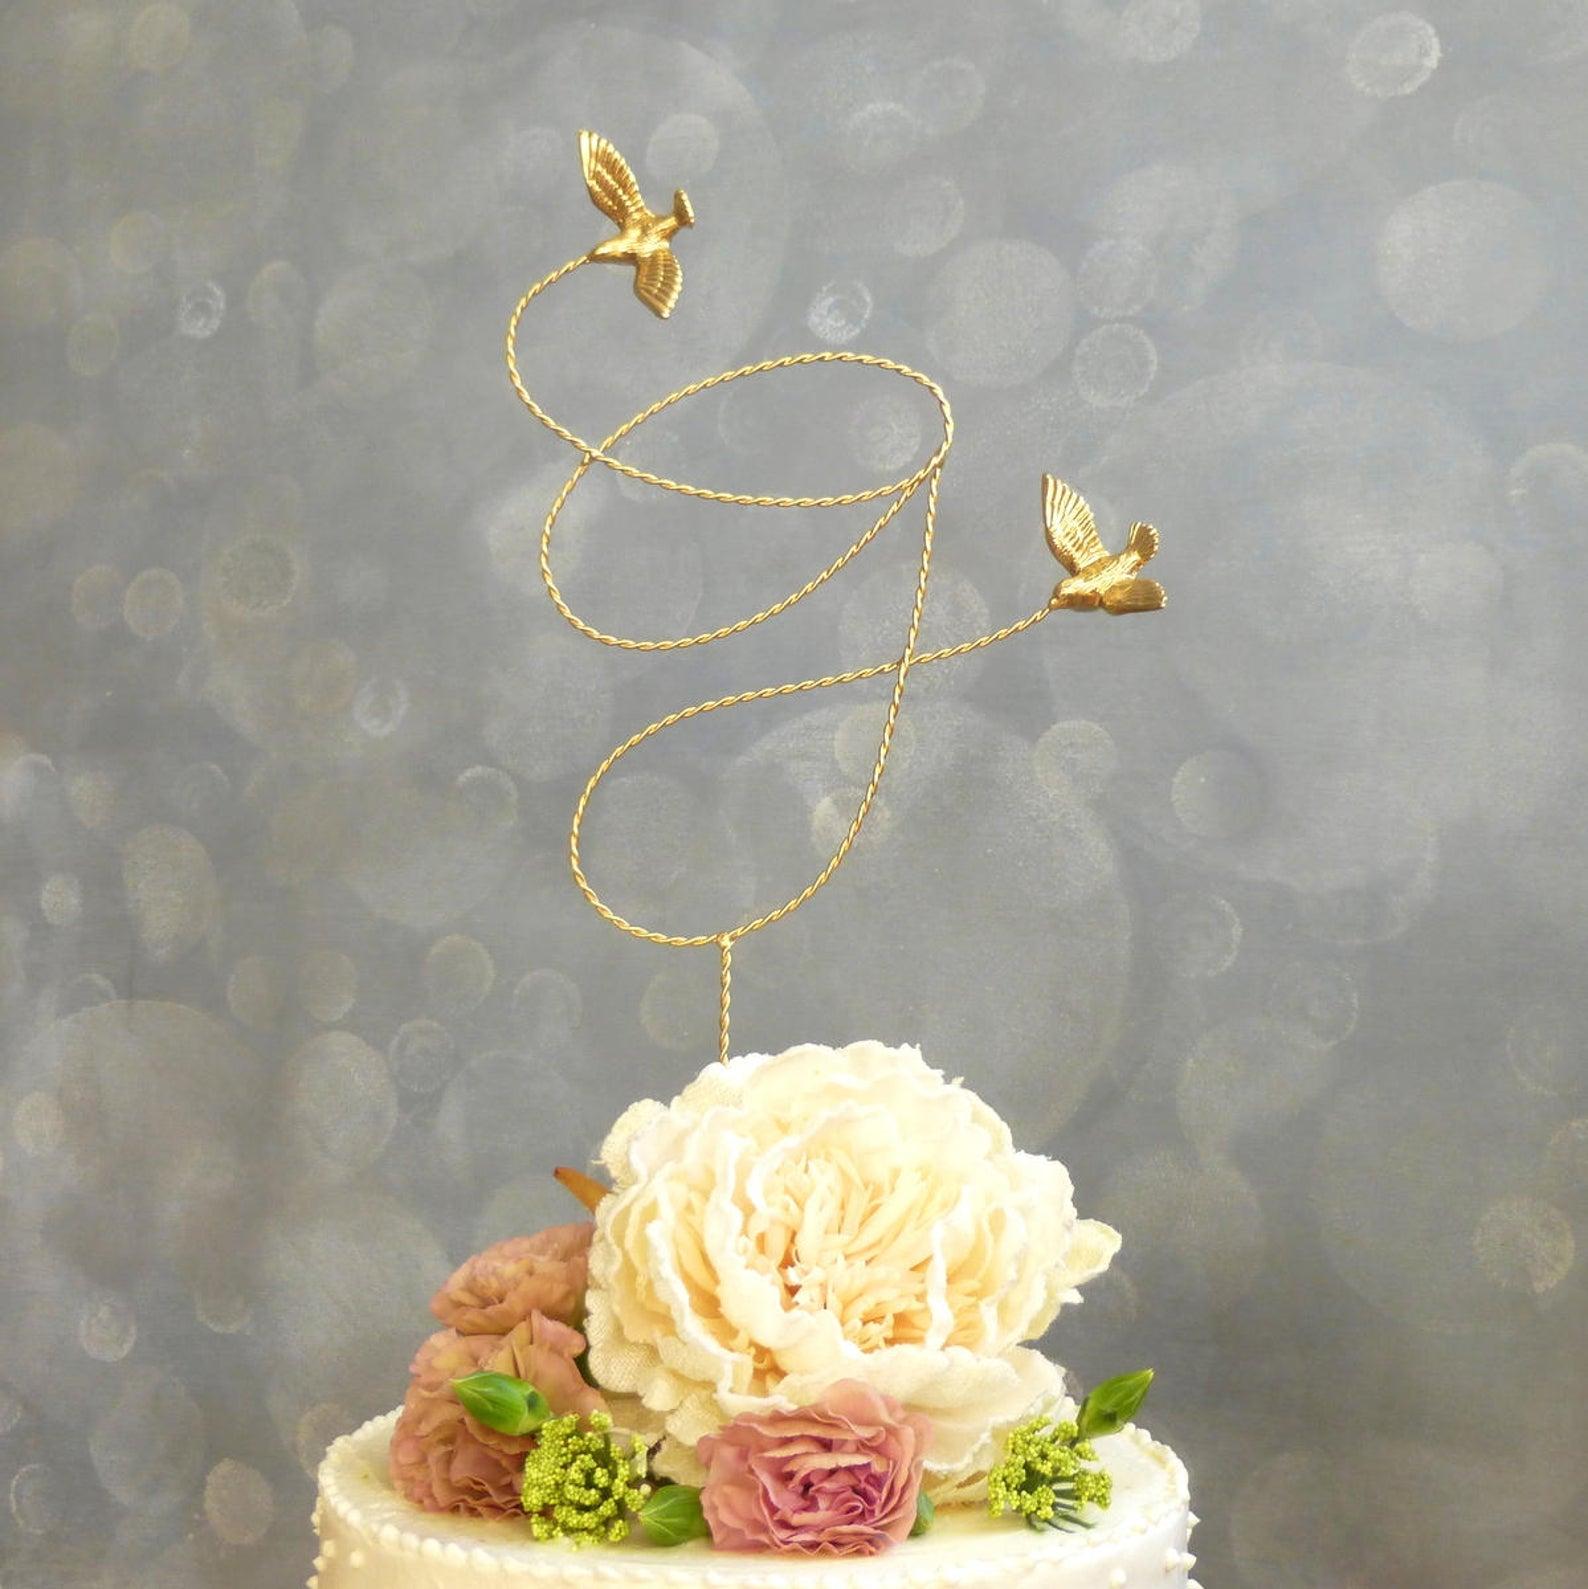 gold wire bird custom cake topper